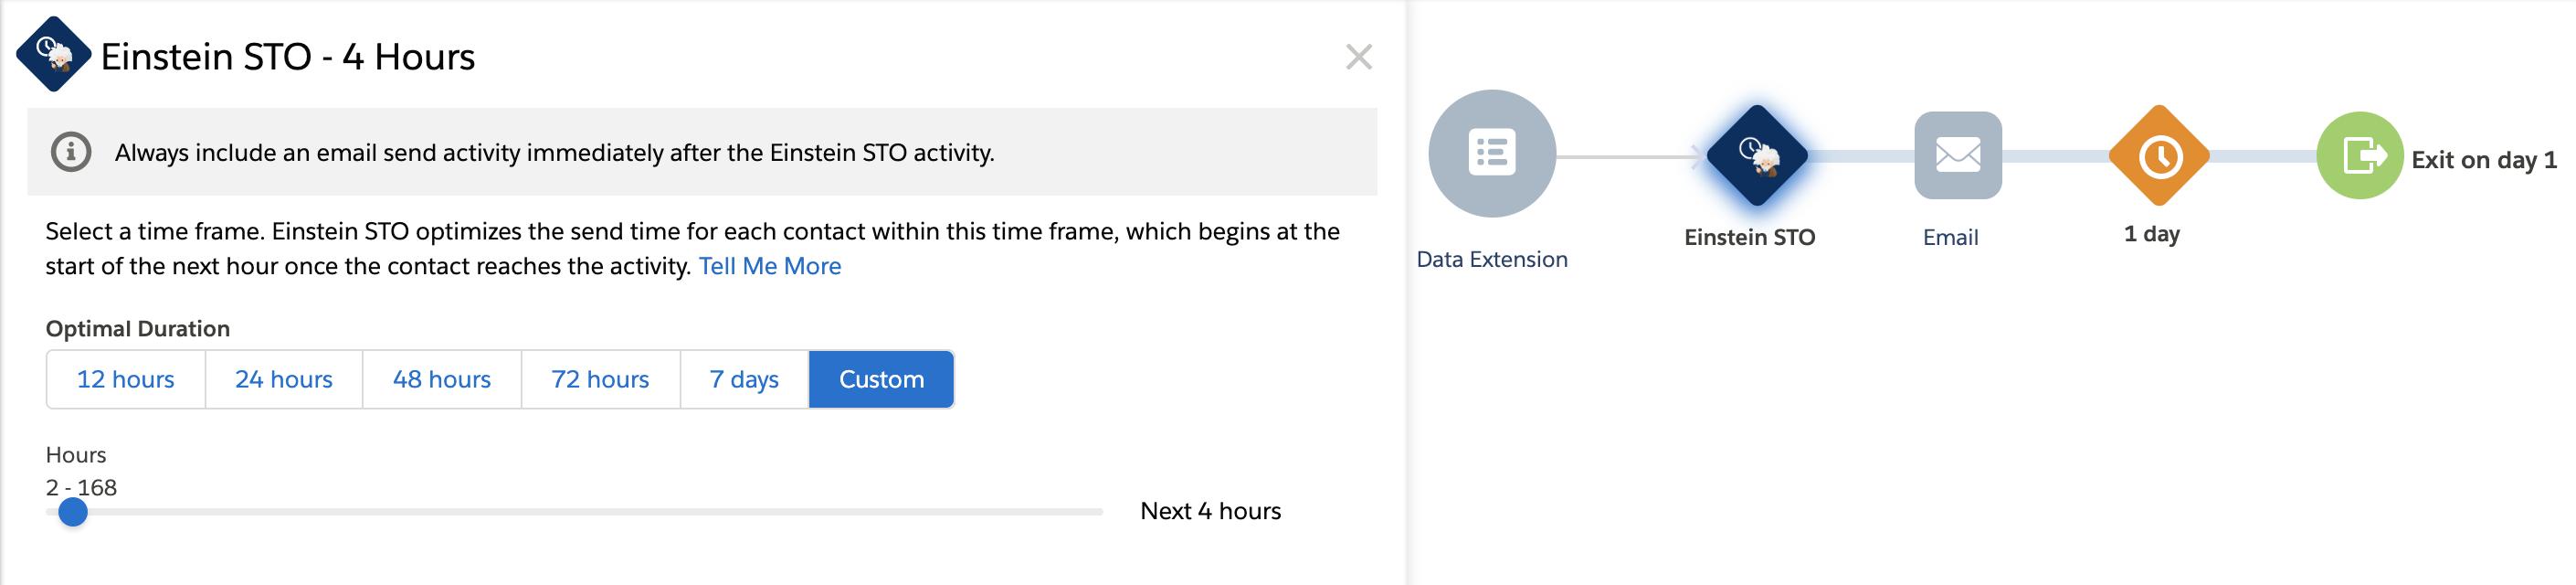 Screenshot 2020-04-26 at 10.35.21 PM